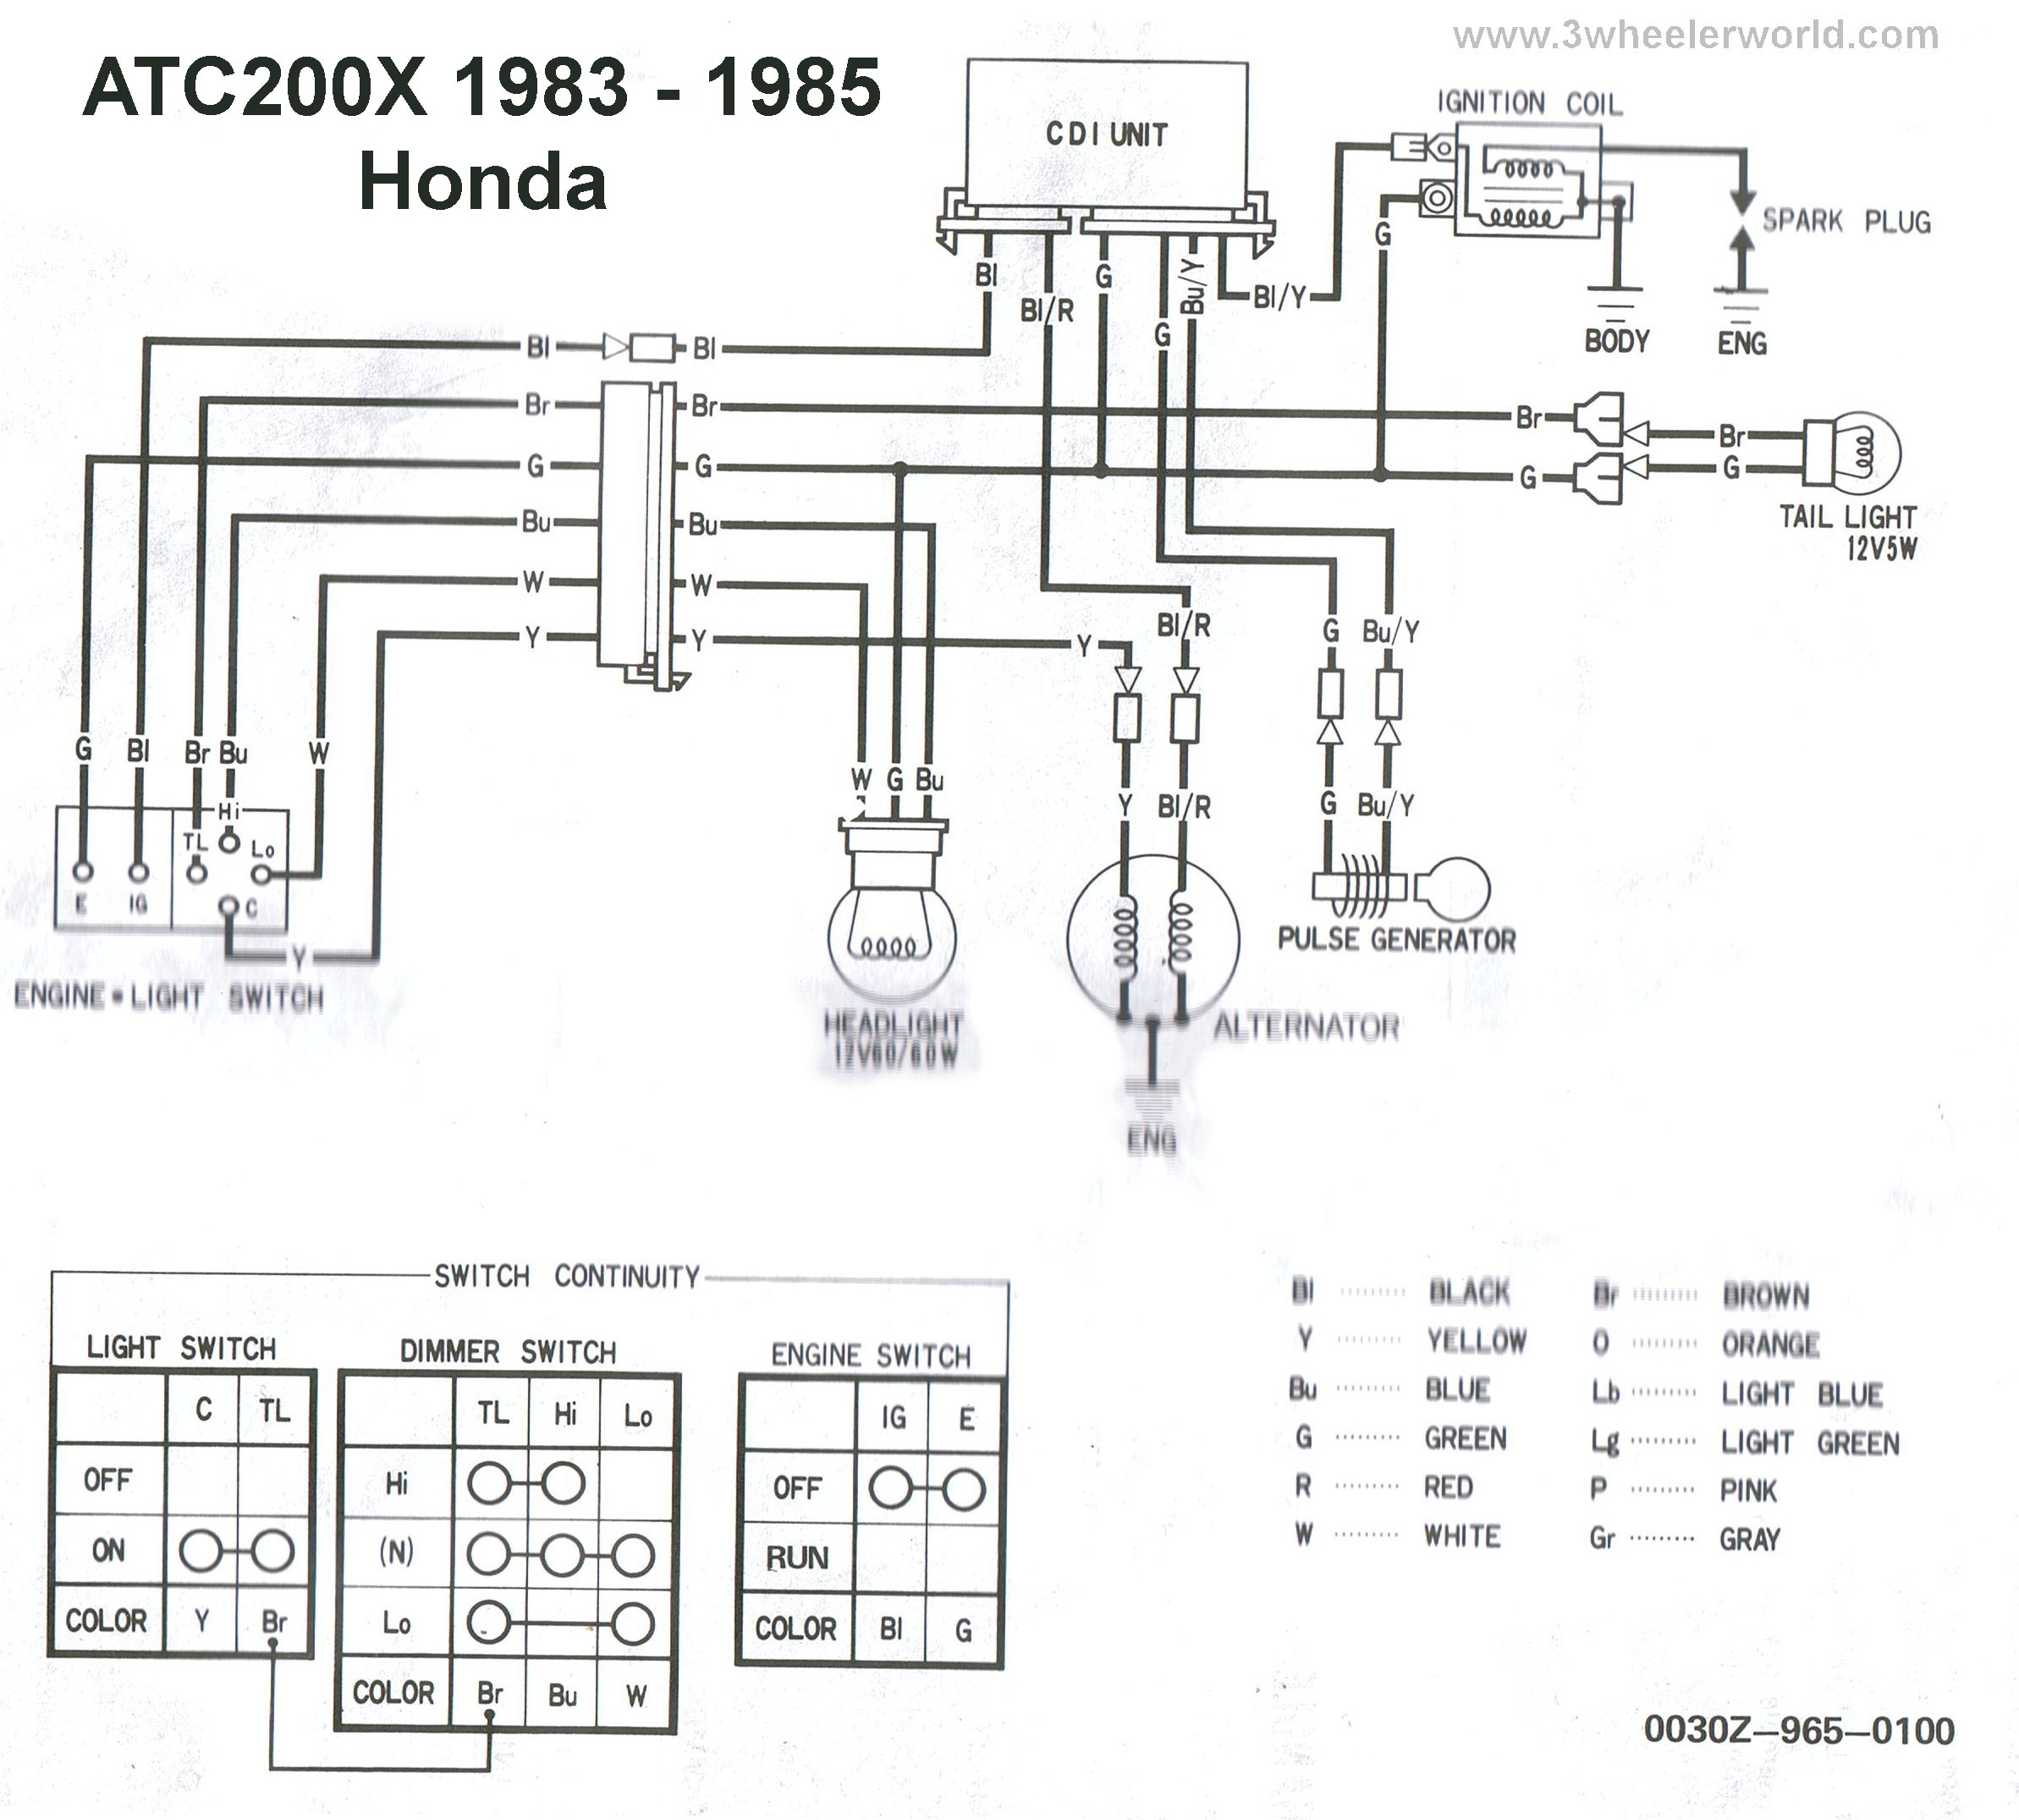 honda atc185 wiring auto electrical wiring diagram rh wiring radtour co Wiring Diagram Symbols Basic Electrical Wiring Diagrams